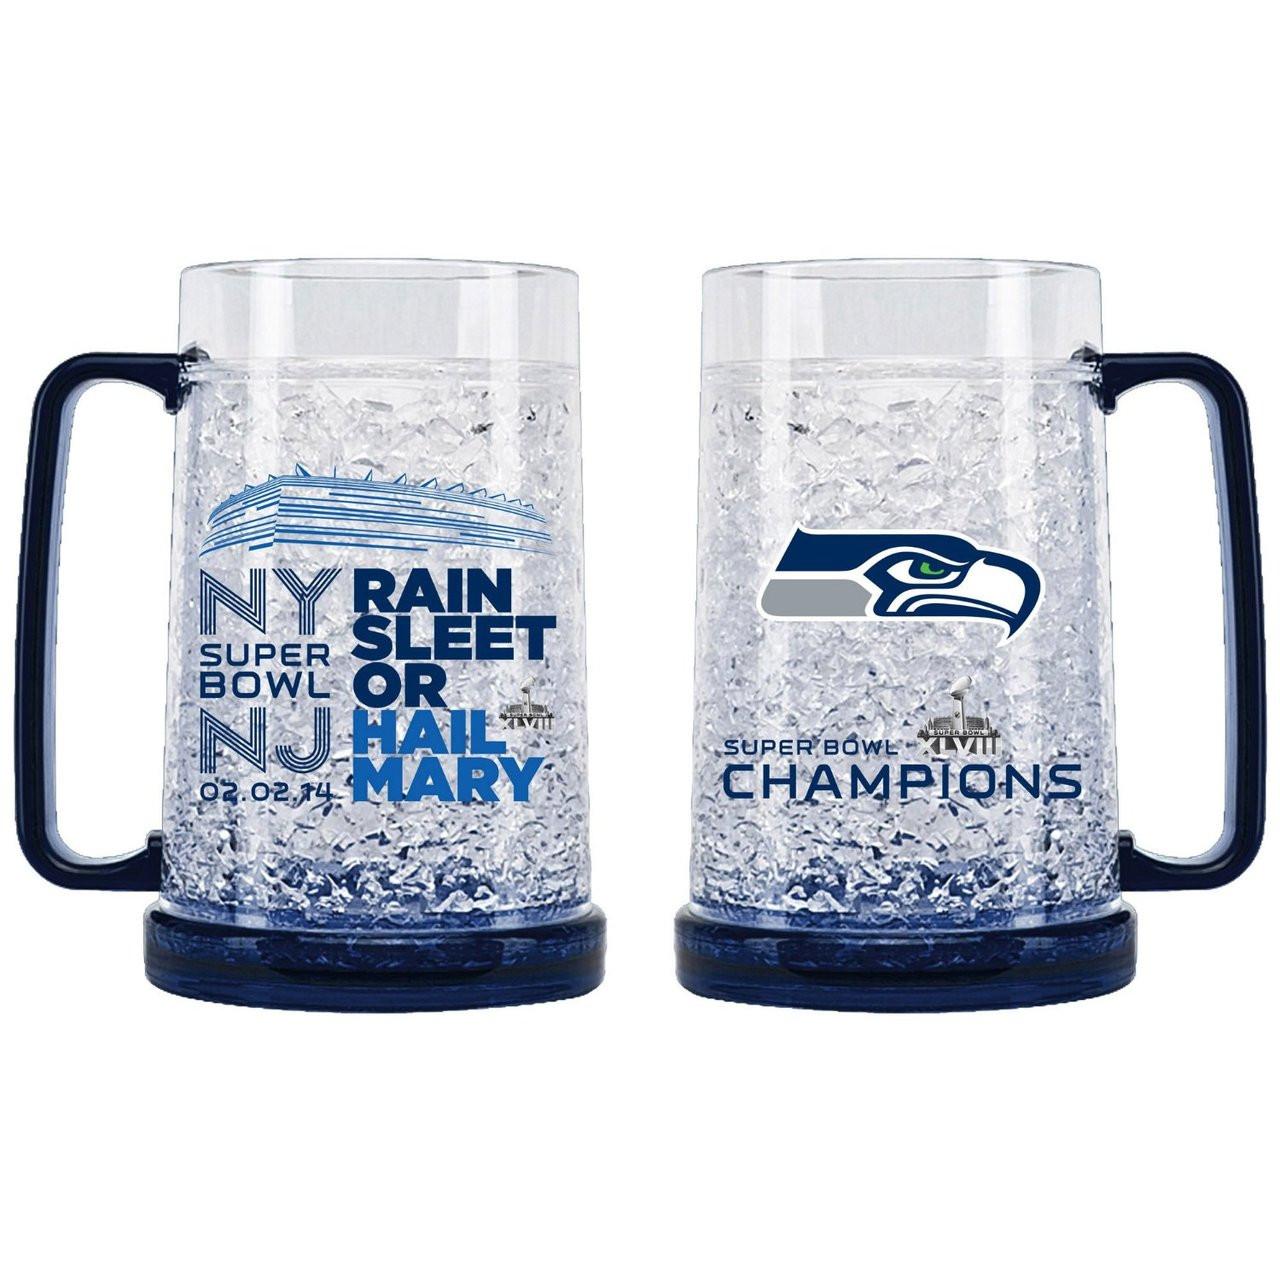 42e53578 Seattle Seahawks Super Bowl XLVIII Champions Crystal Freezer Mug